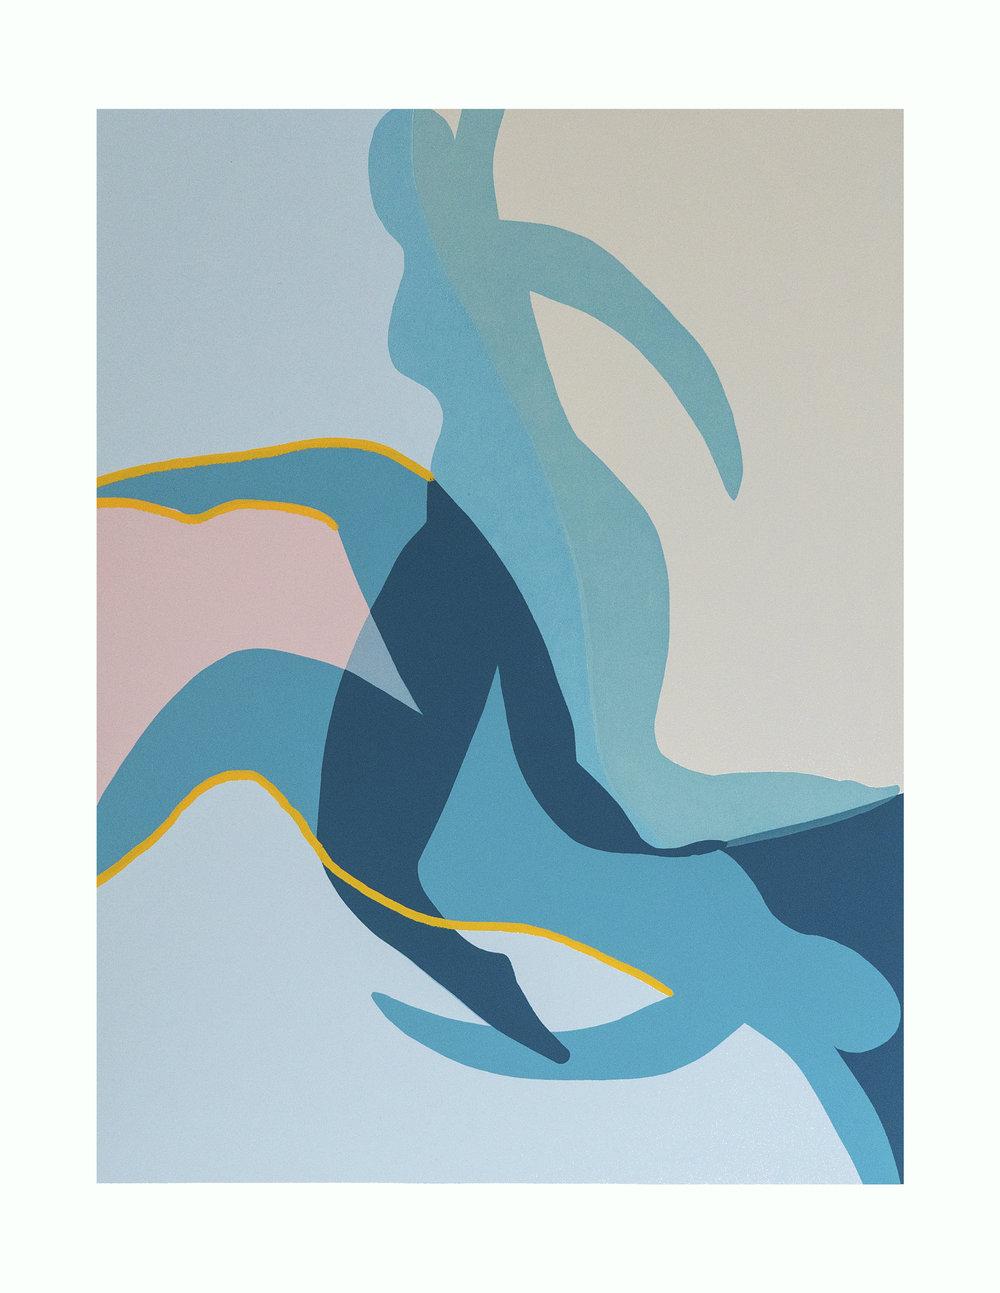 'Dreamers', 50x39cm